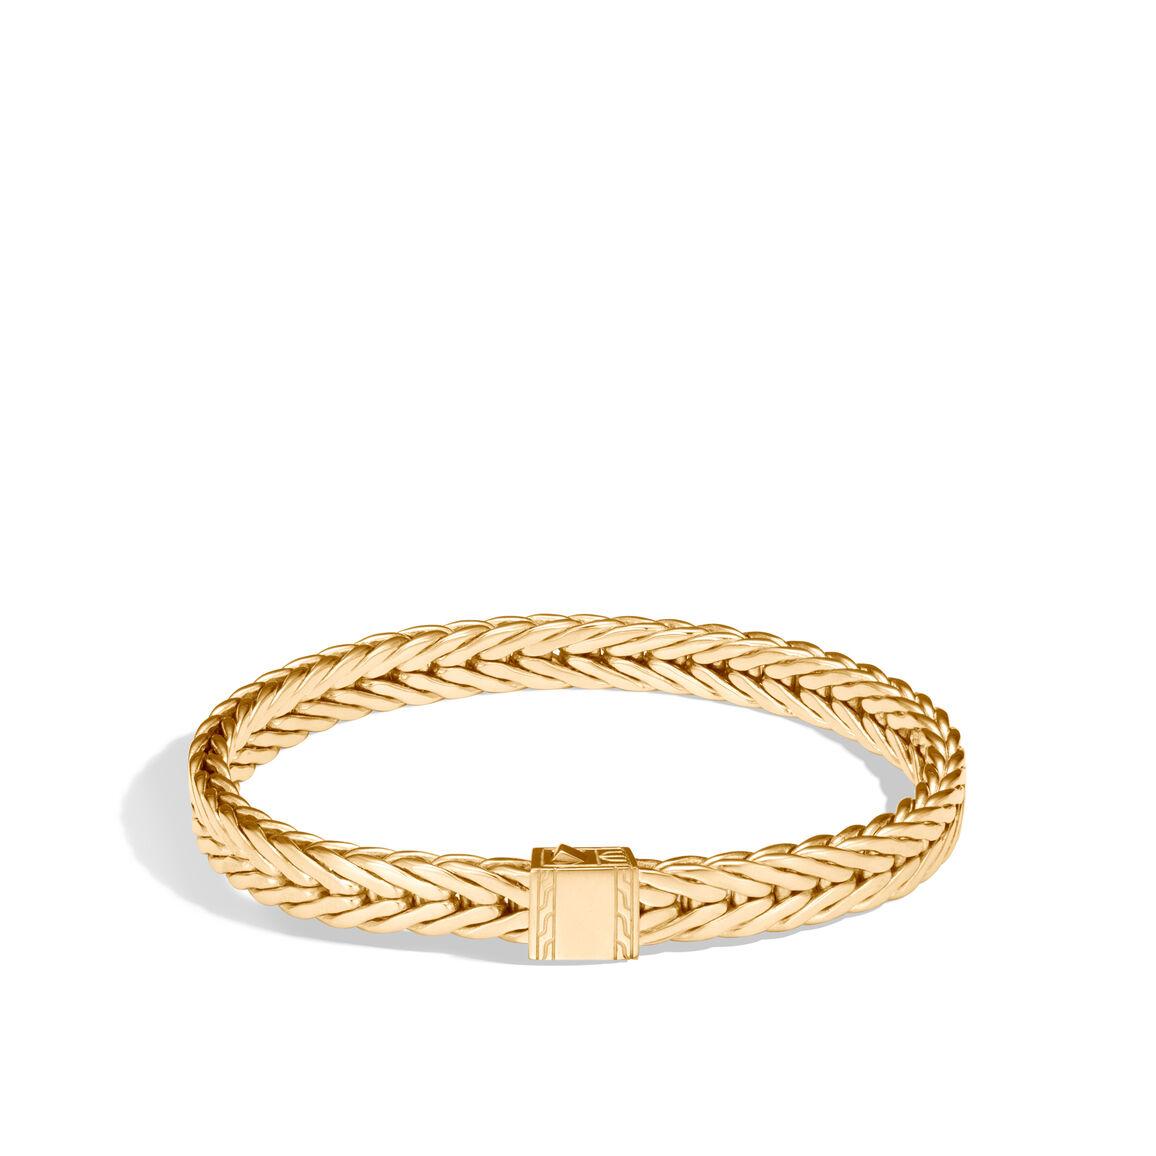 Modern Chain 7MM Bracelet in 18K Gold